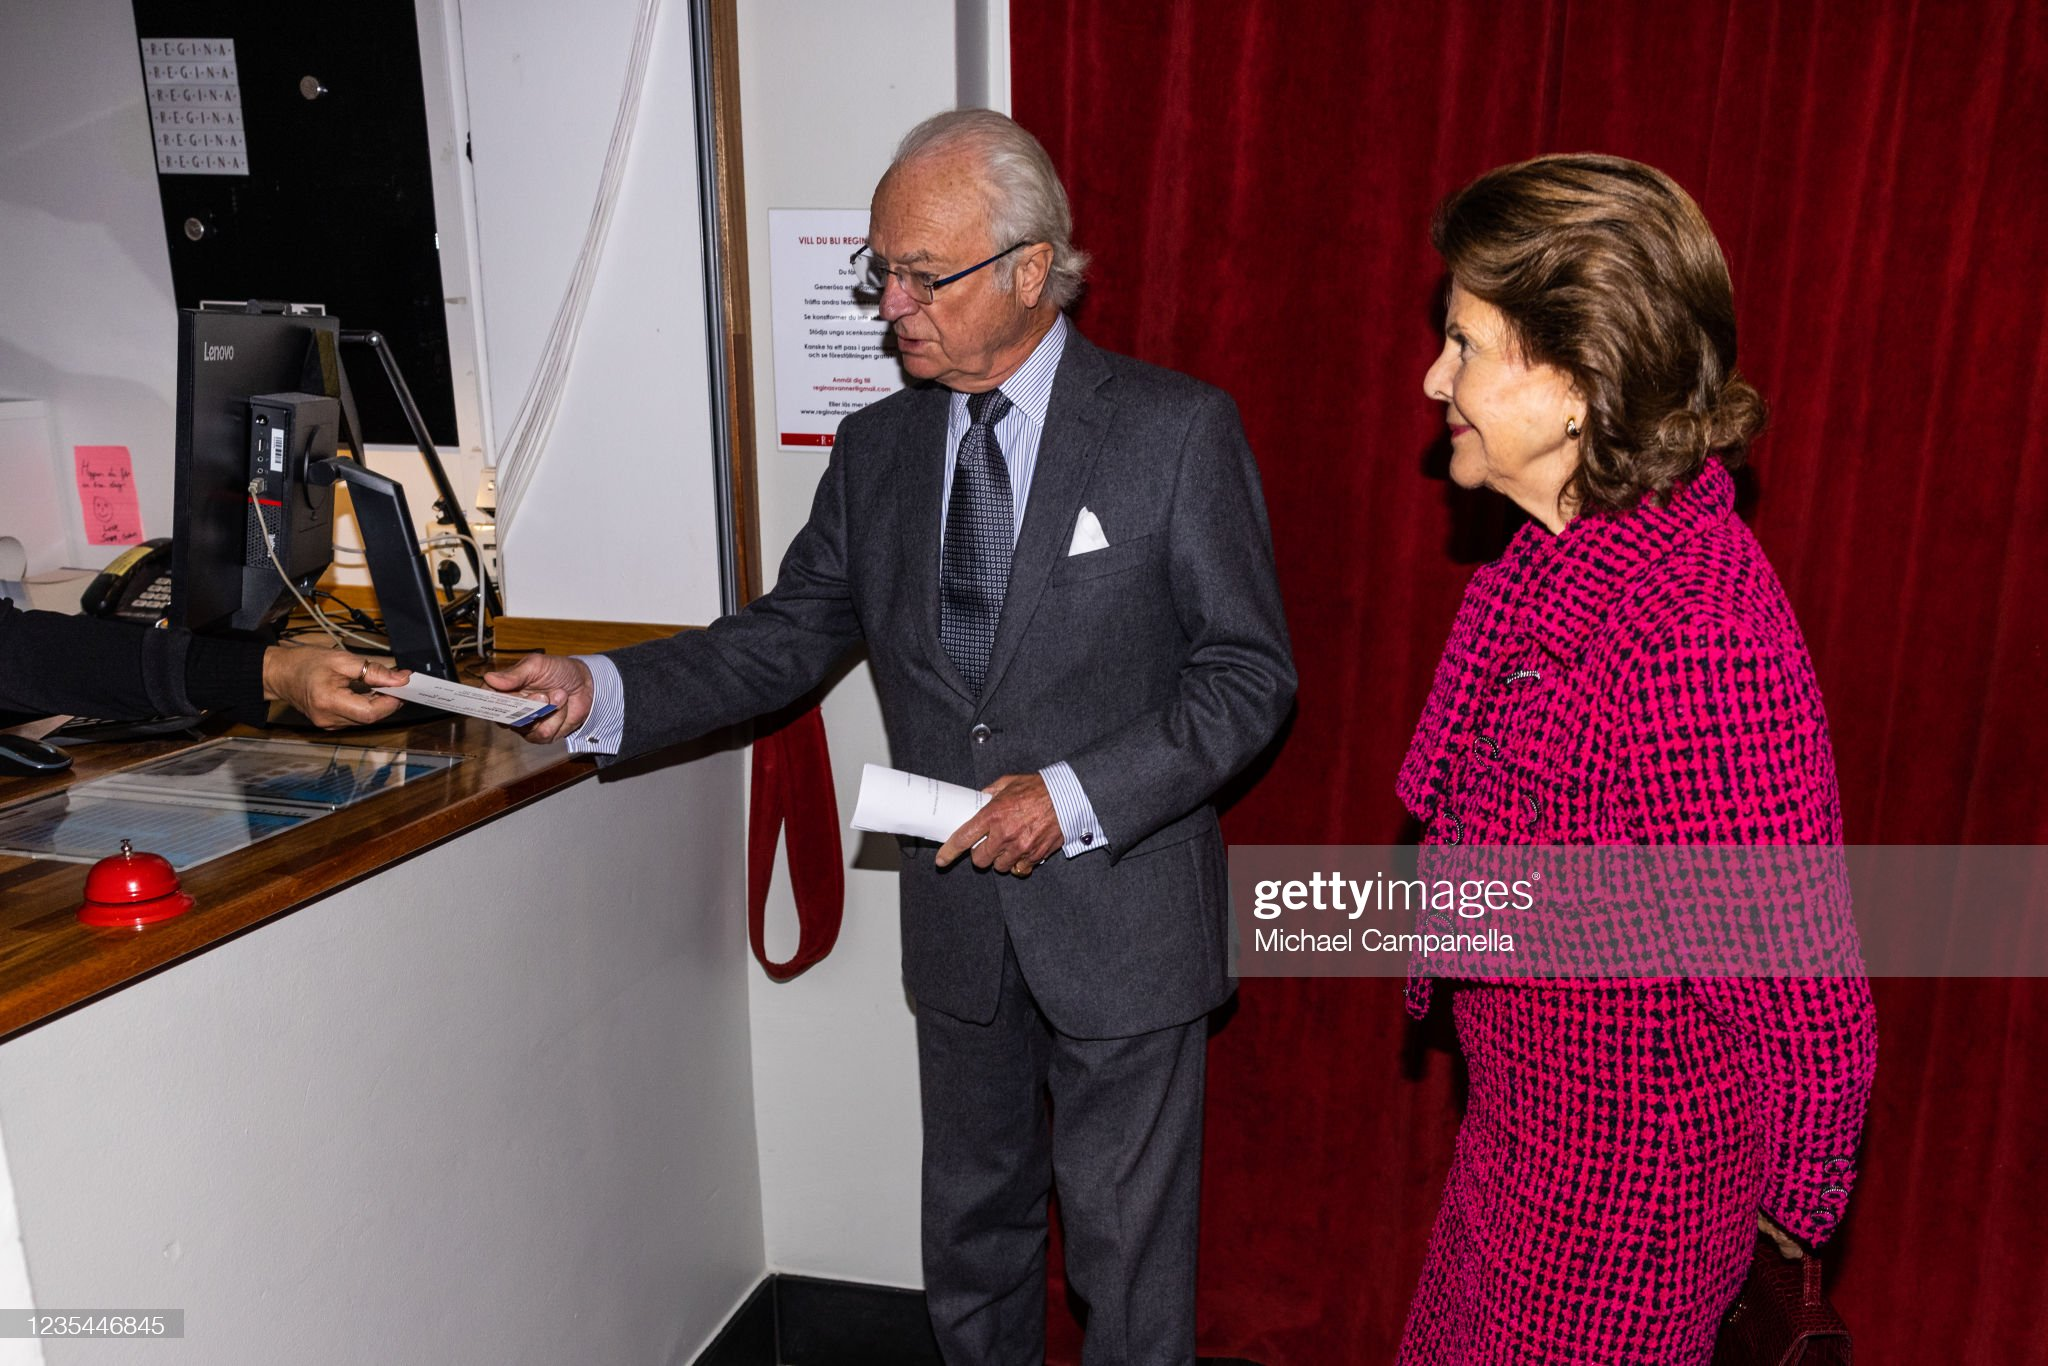 Swedish Royals Visit Uppsala County : News Photo